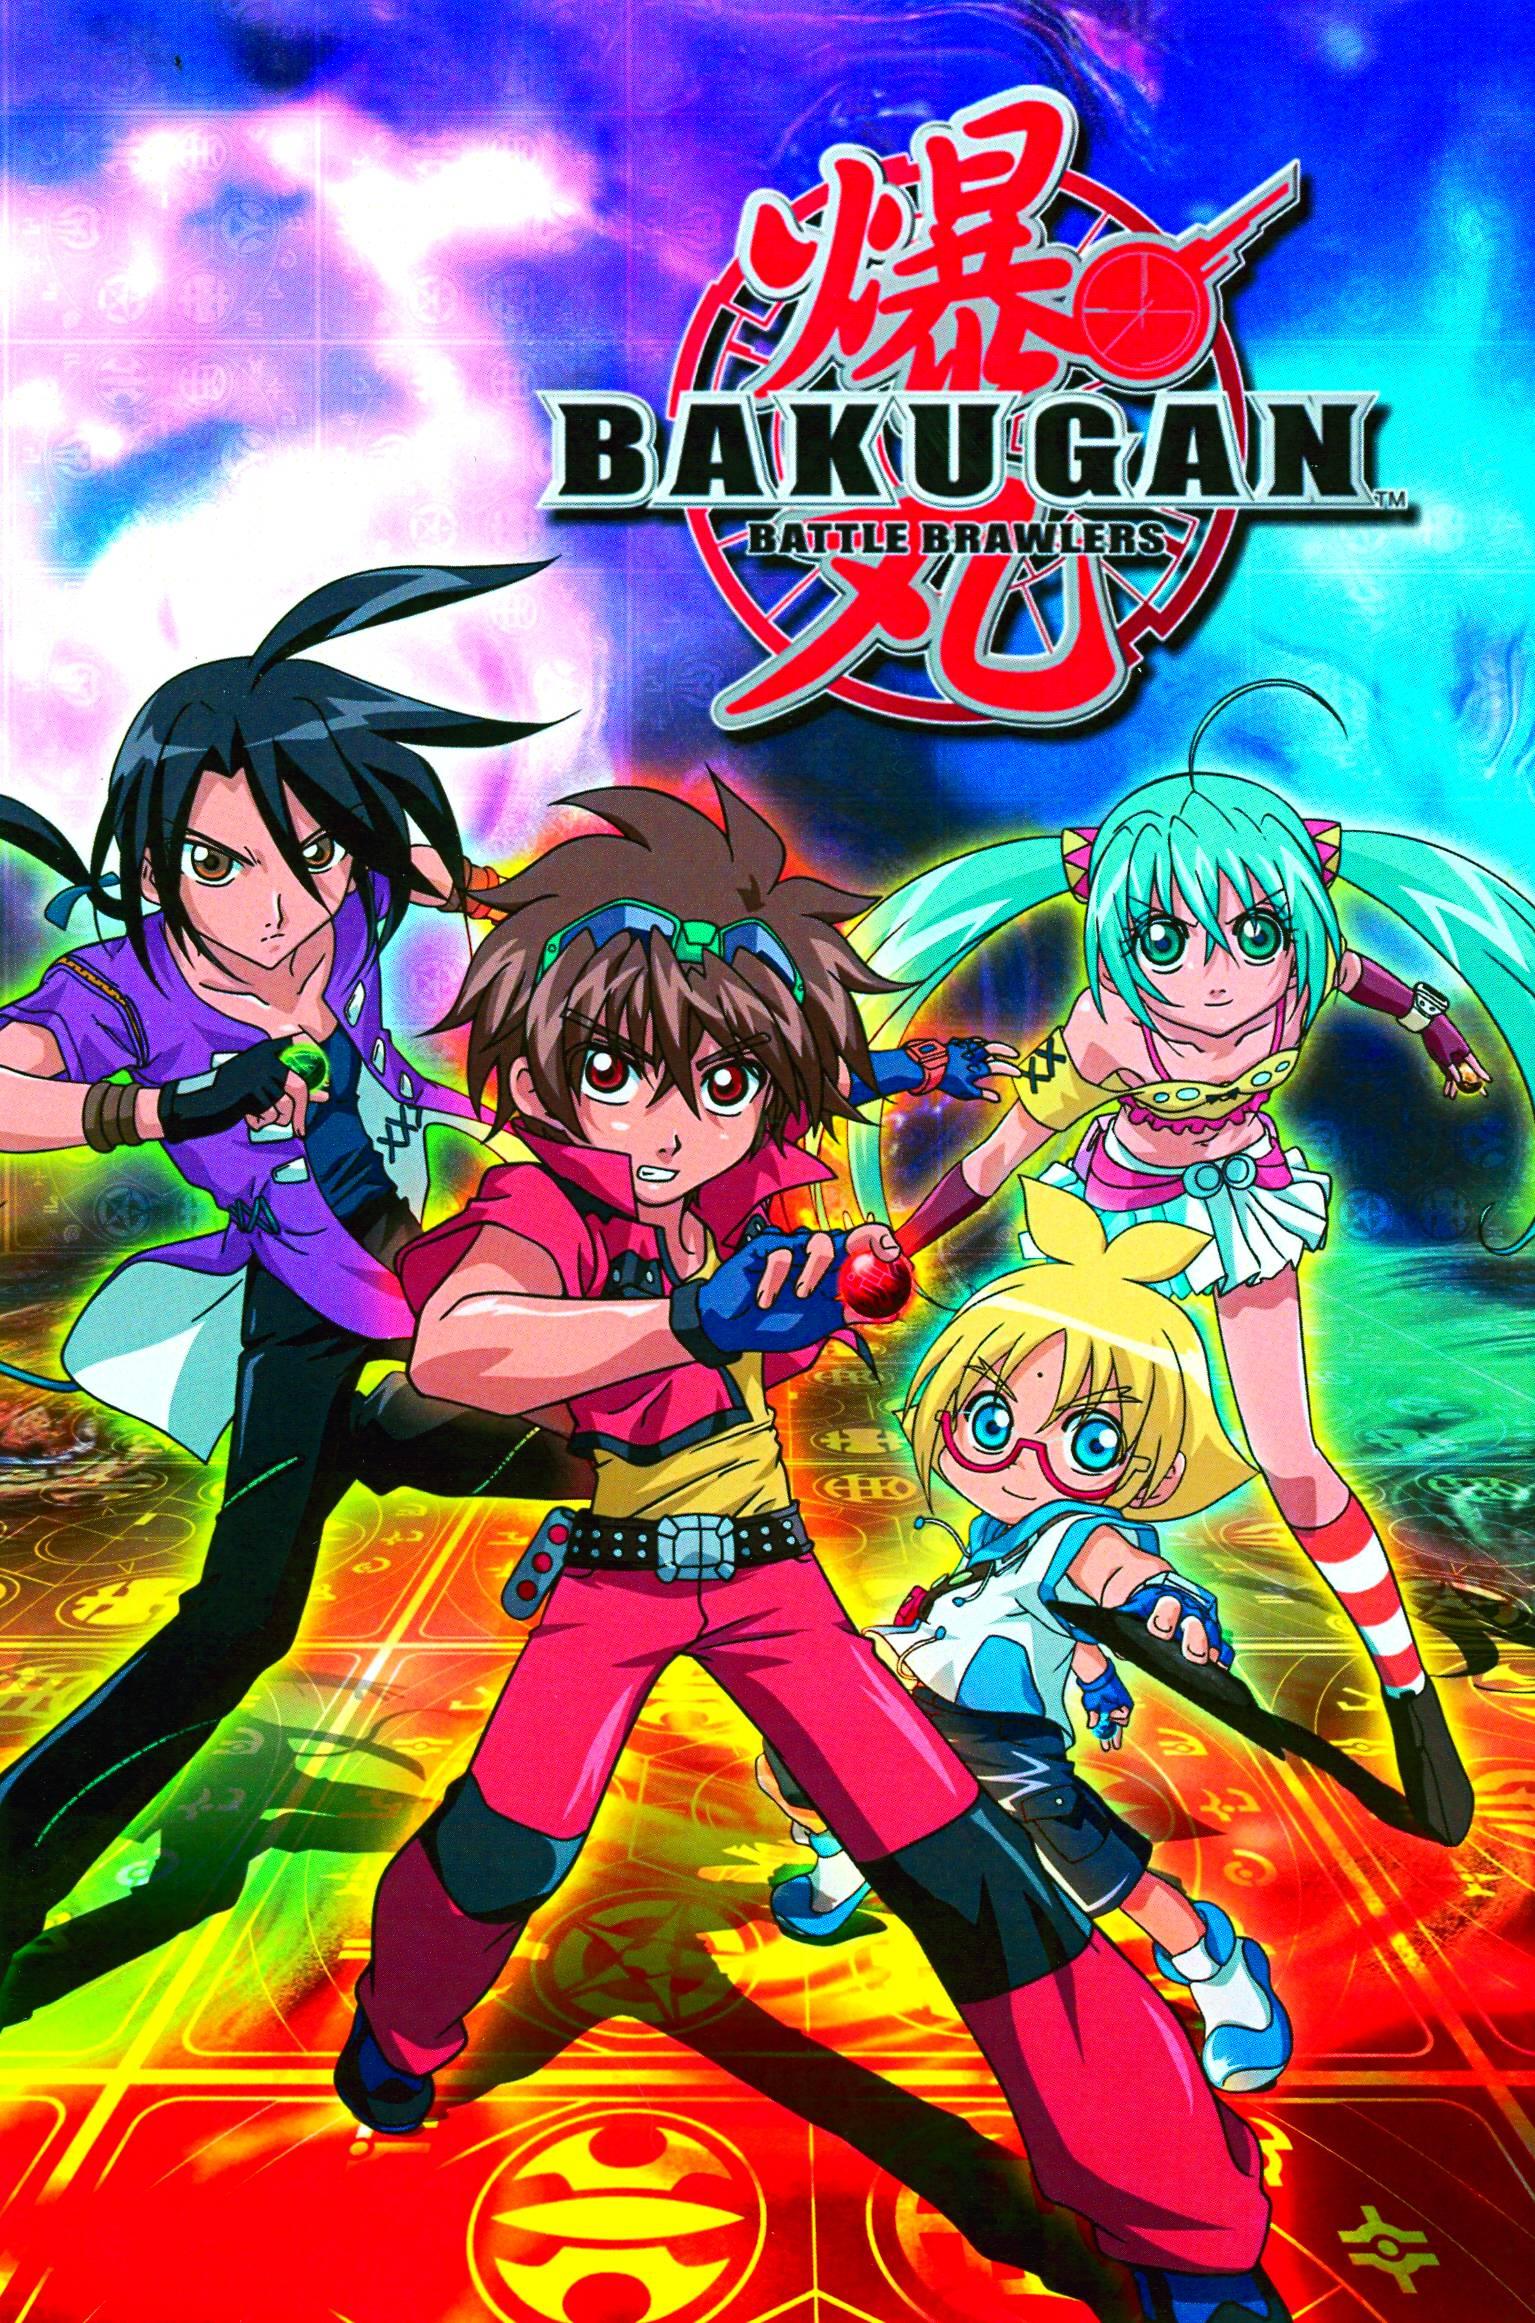 Bakugan battle brawlers manga volume 1 evo tournament bakugan battle brawlers manga volume 1 evo tournament forbiddenplanet uk and worldwide cult entertainment megastore voltagebd Gallery